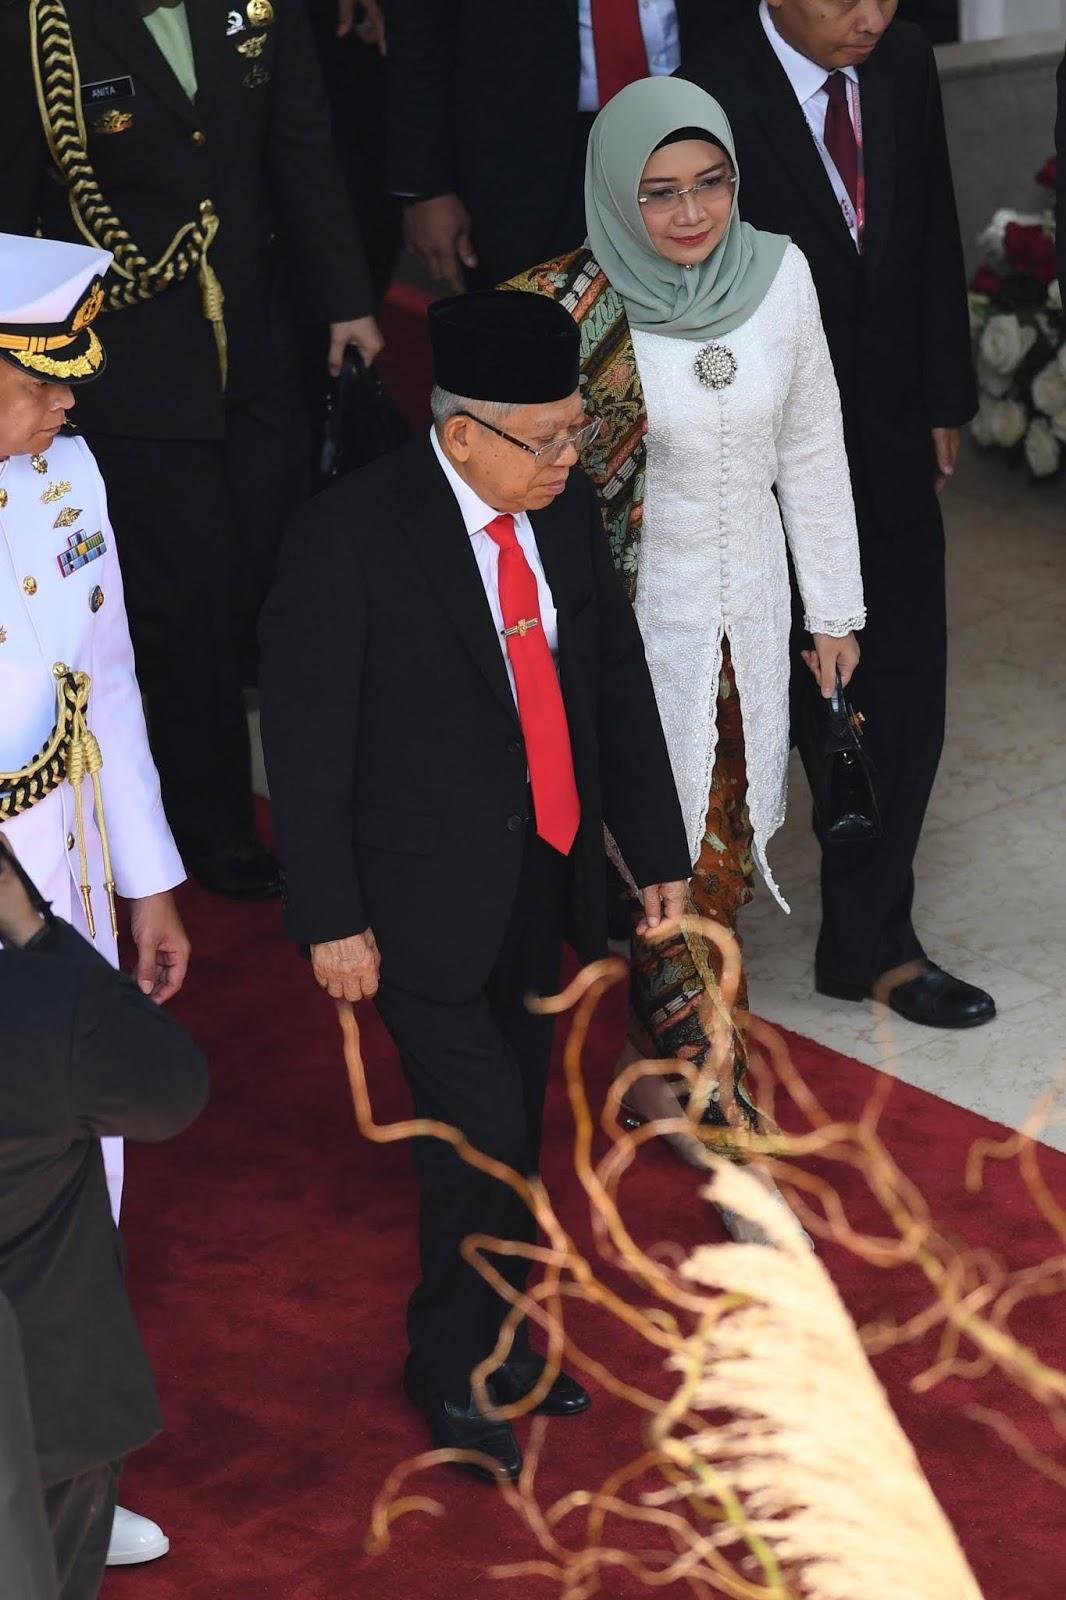 Subhanallah, Harga Tas Istri Wakil Presiden Hanya Rp800 Juta?